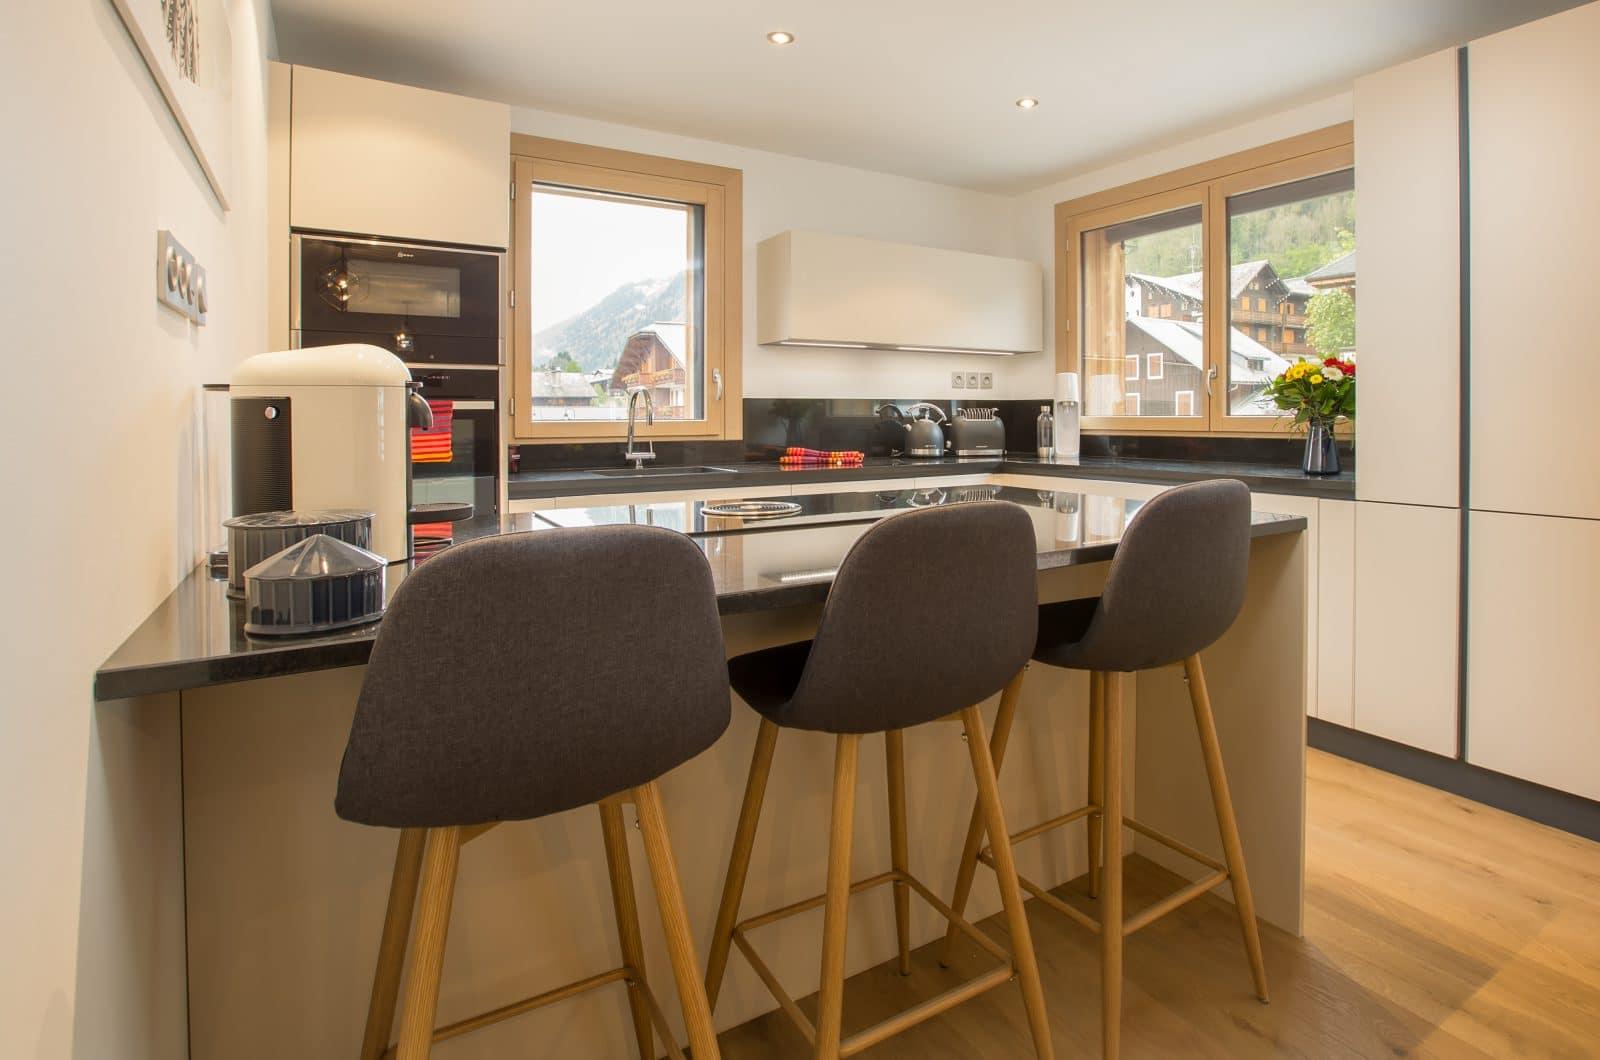 Apartment Asta Kitchen 50m from Pleney Lift Morzine